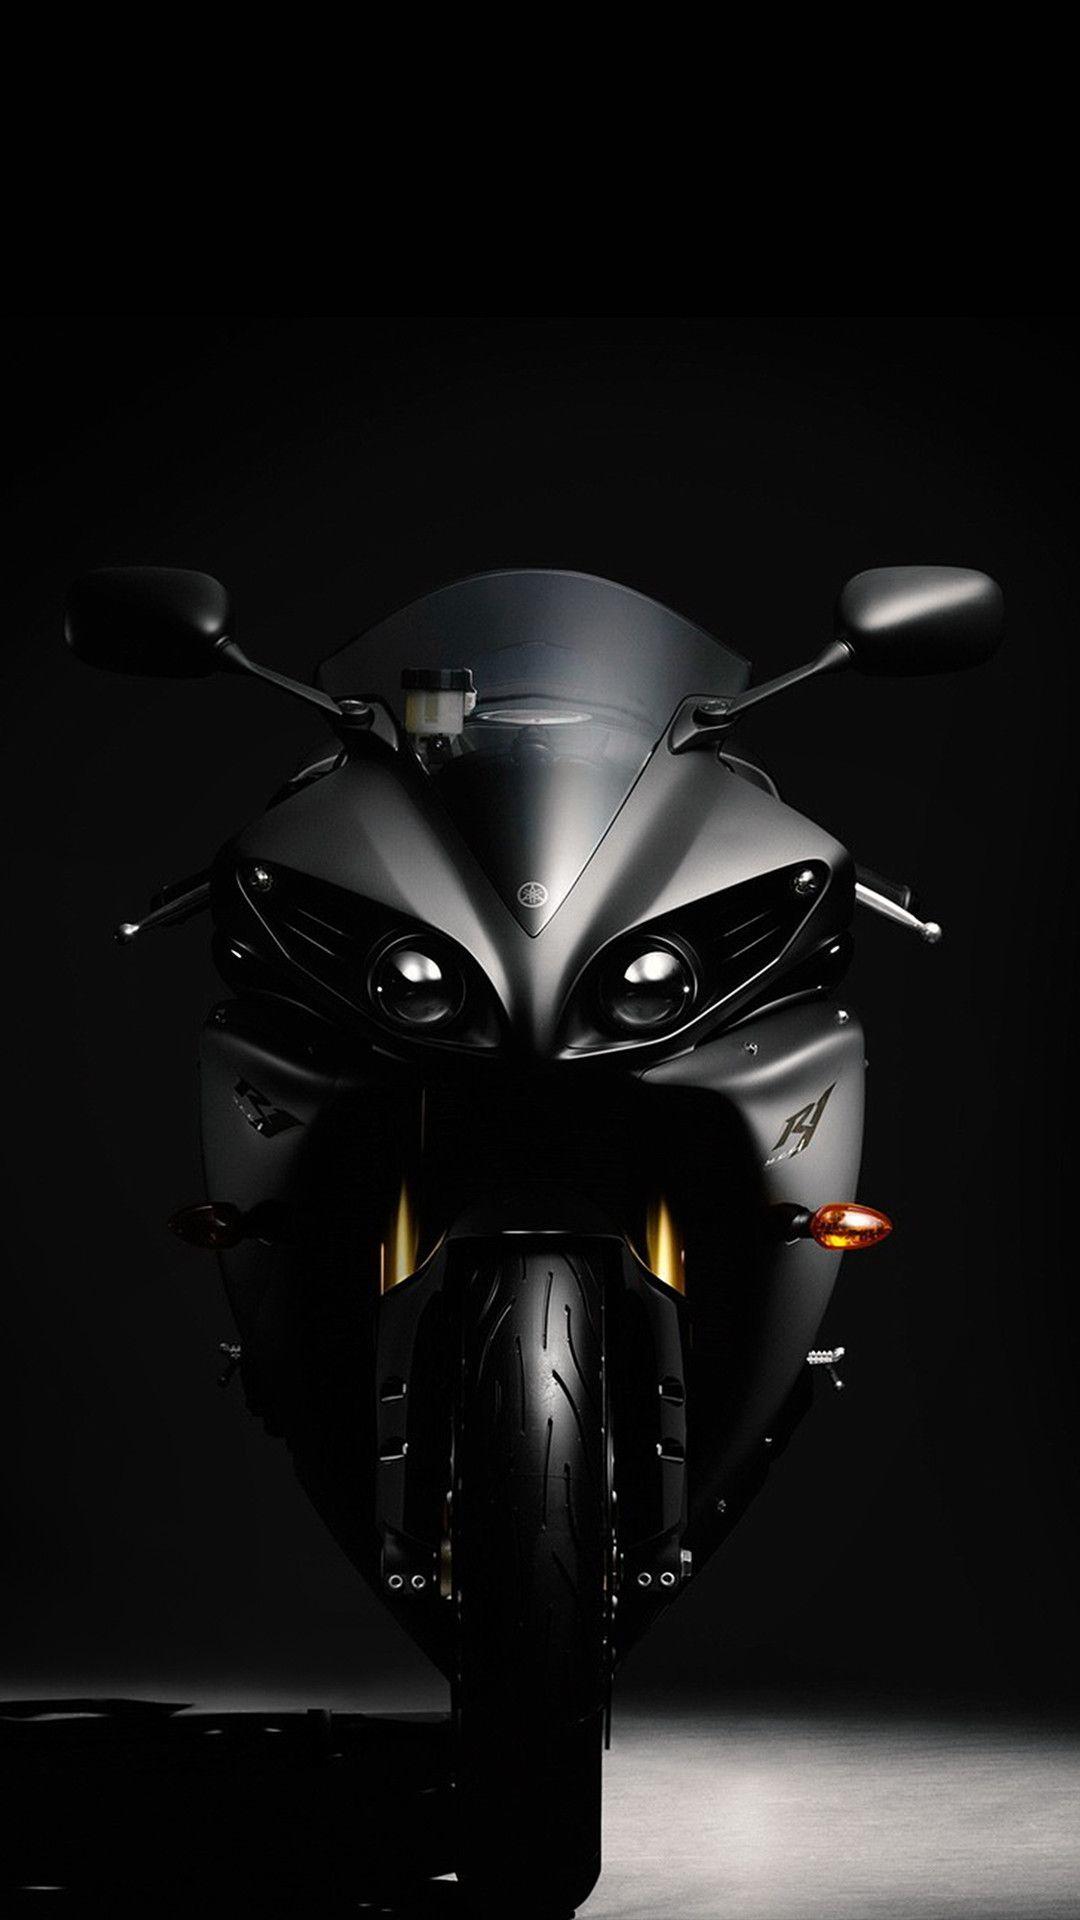 Black R1 Phone Wallpaper Motorcycle Page Motorcycle wallpaper 1080x1920